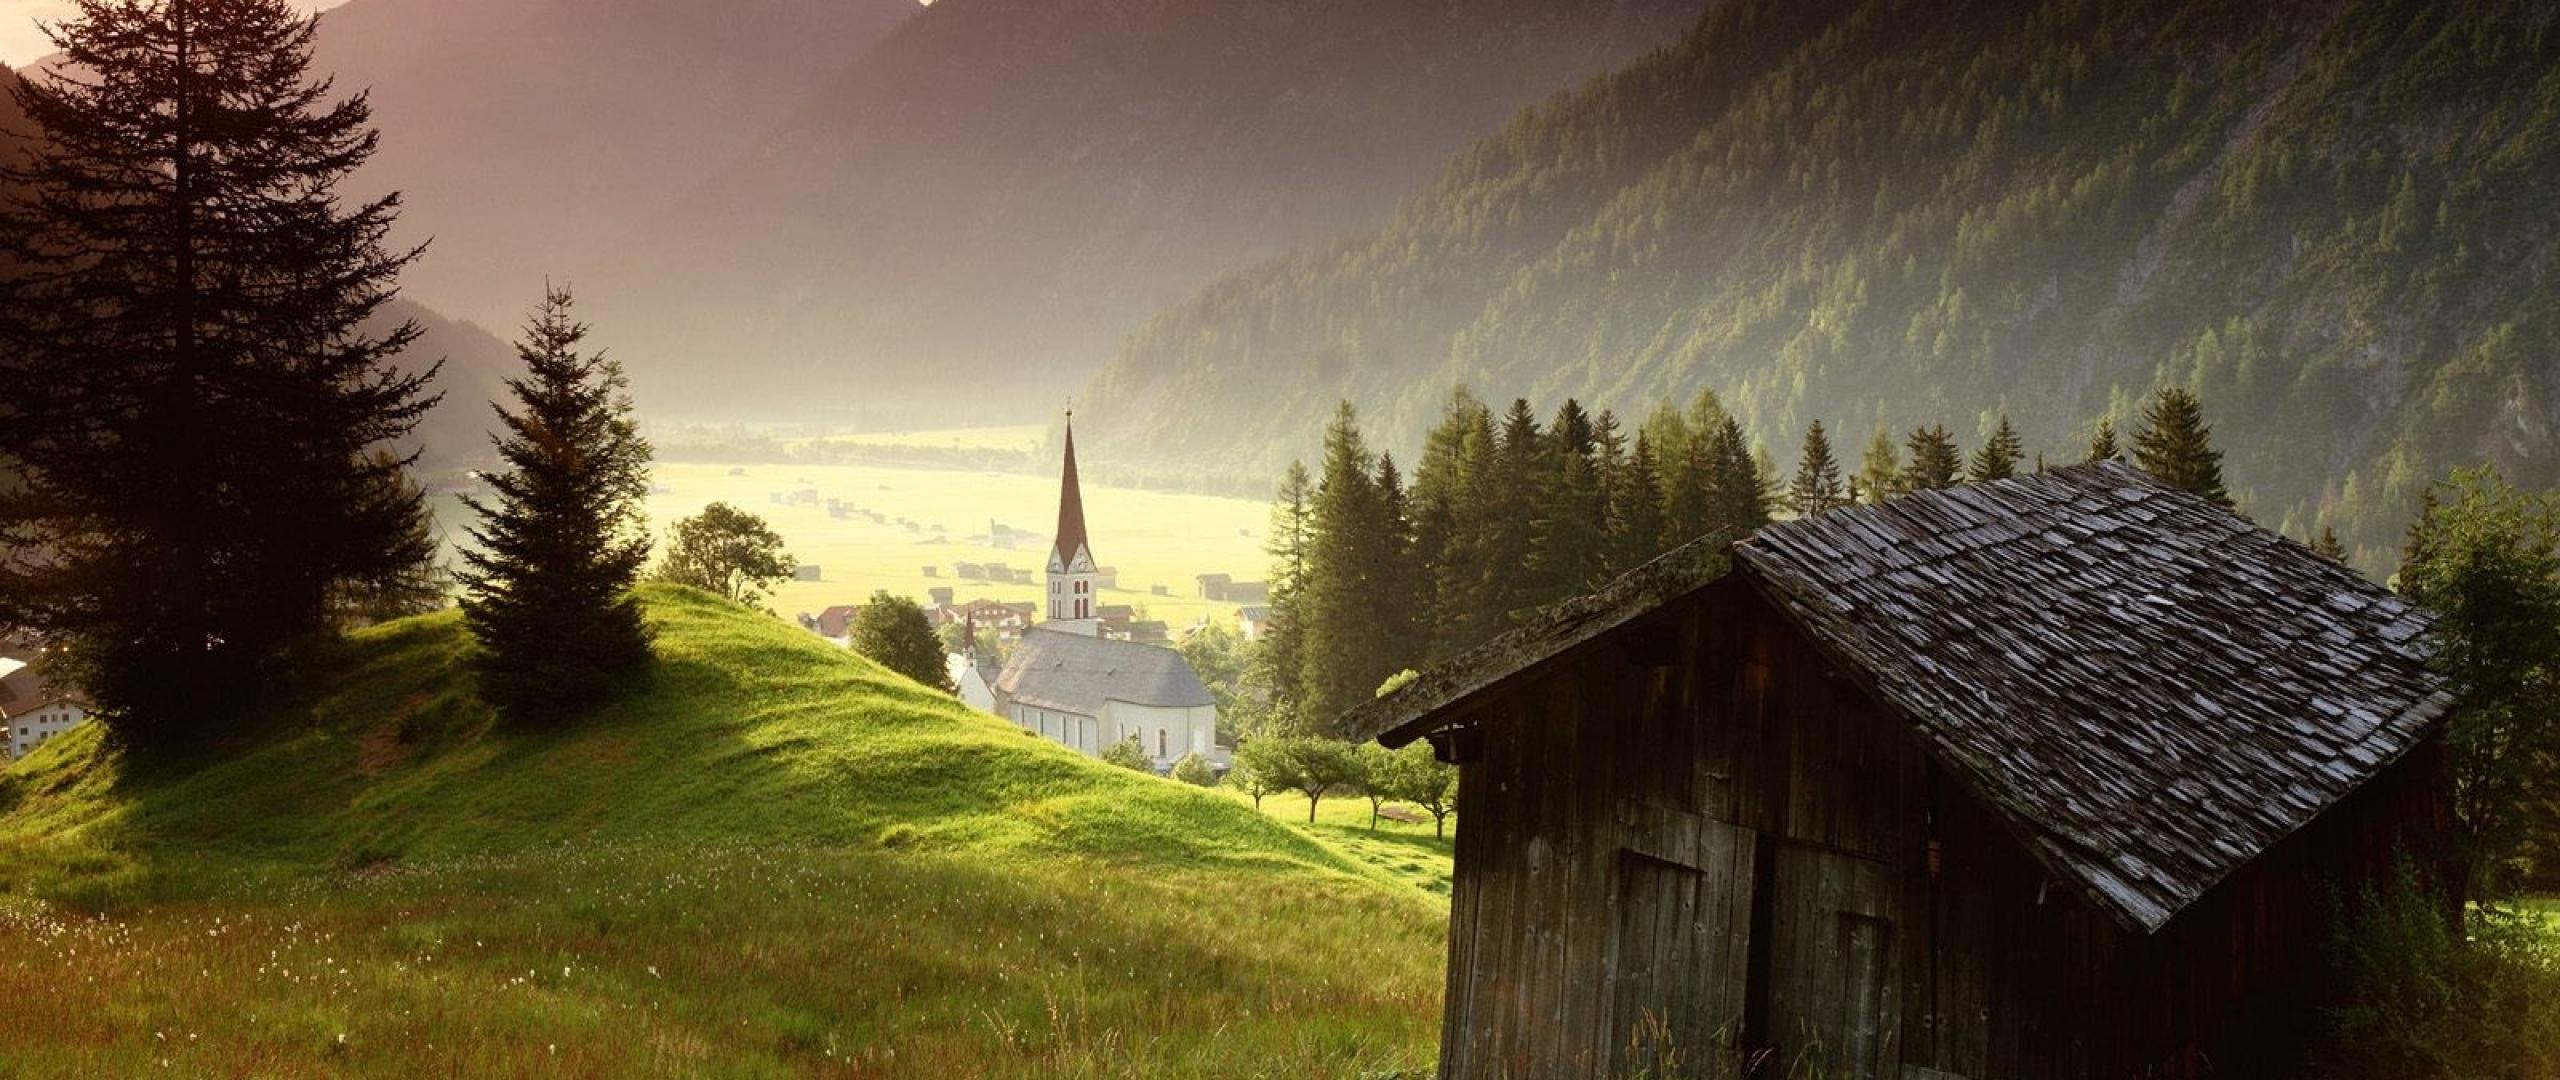 Wallpaper 2560x1080 tyrol austria misty mountain village 2560x1080 2560x1080